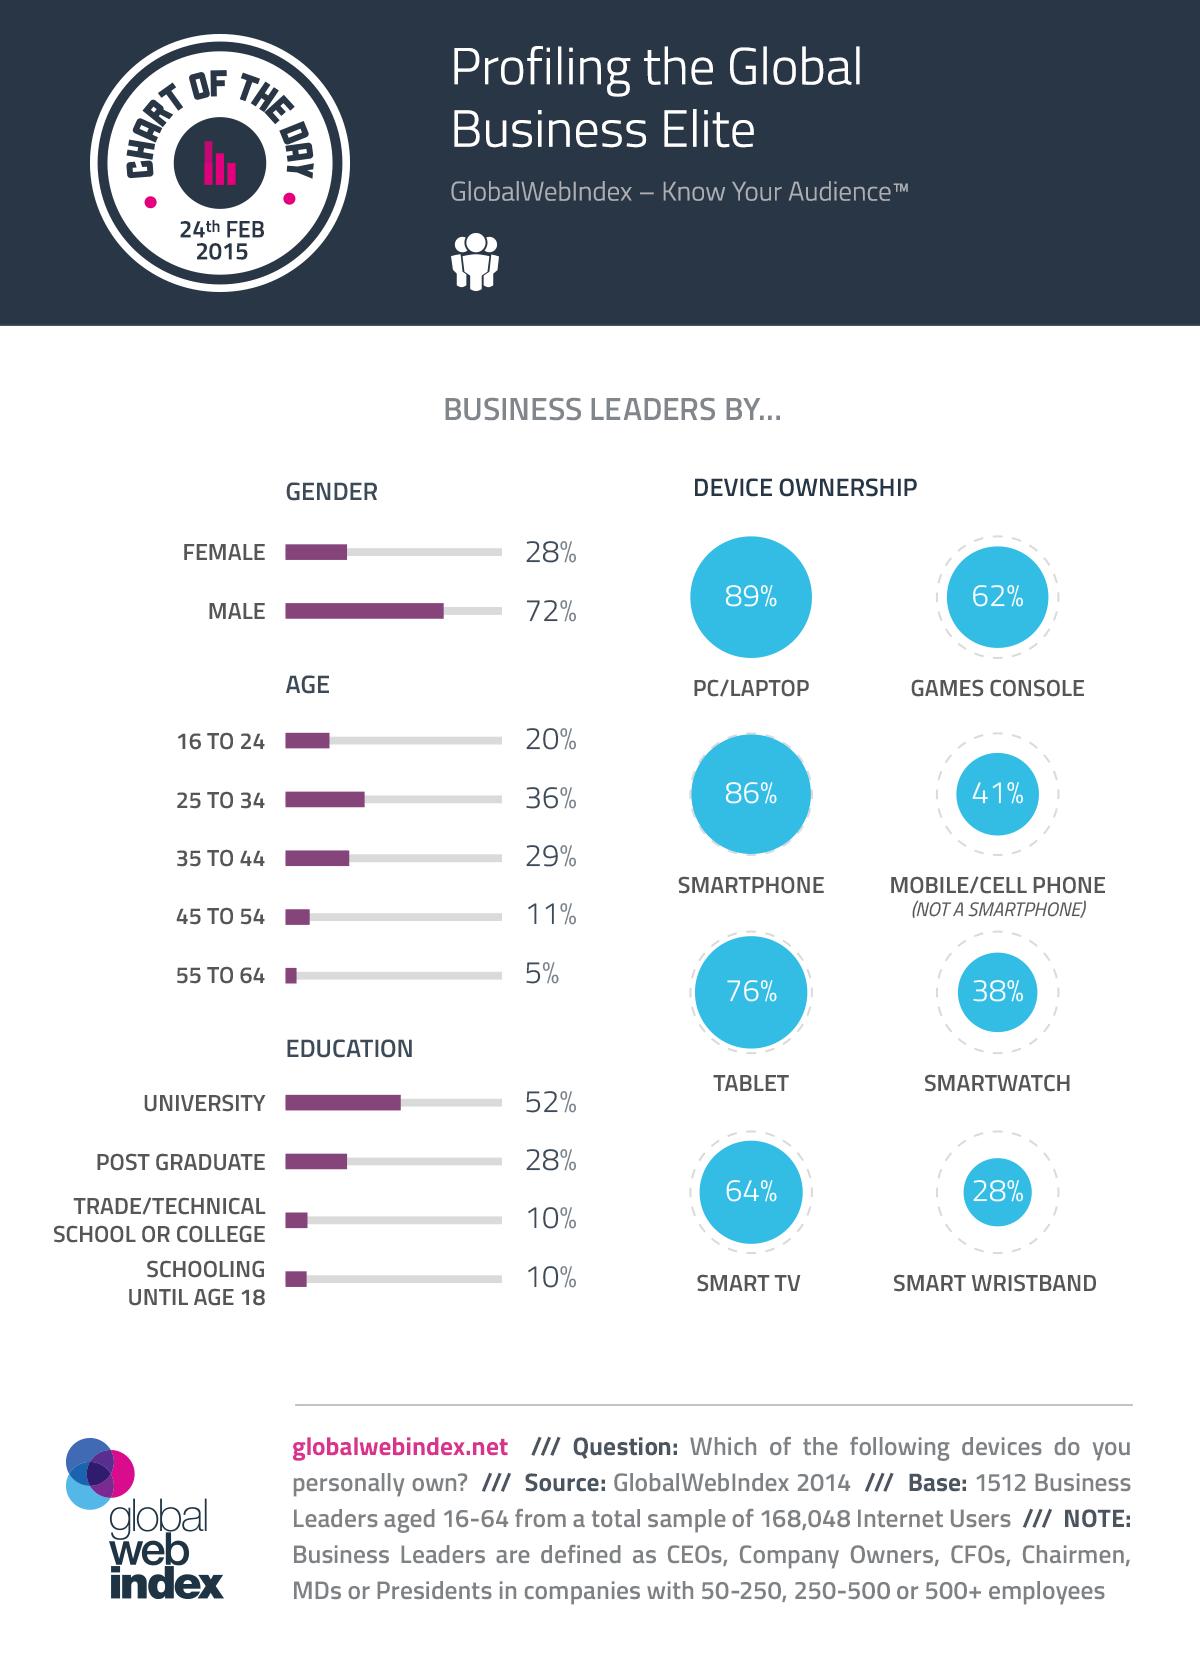 24th-Feb-2015-Profiling-the-Global-Business-Elite